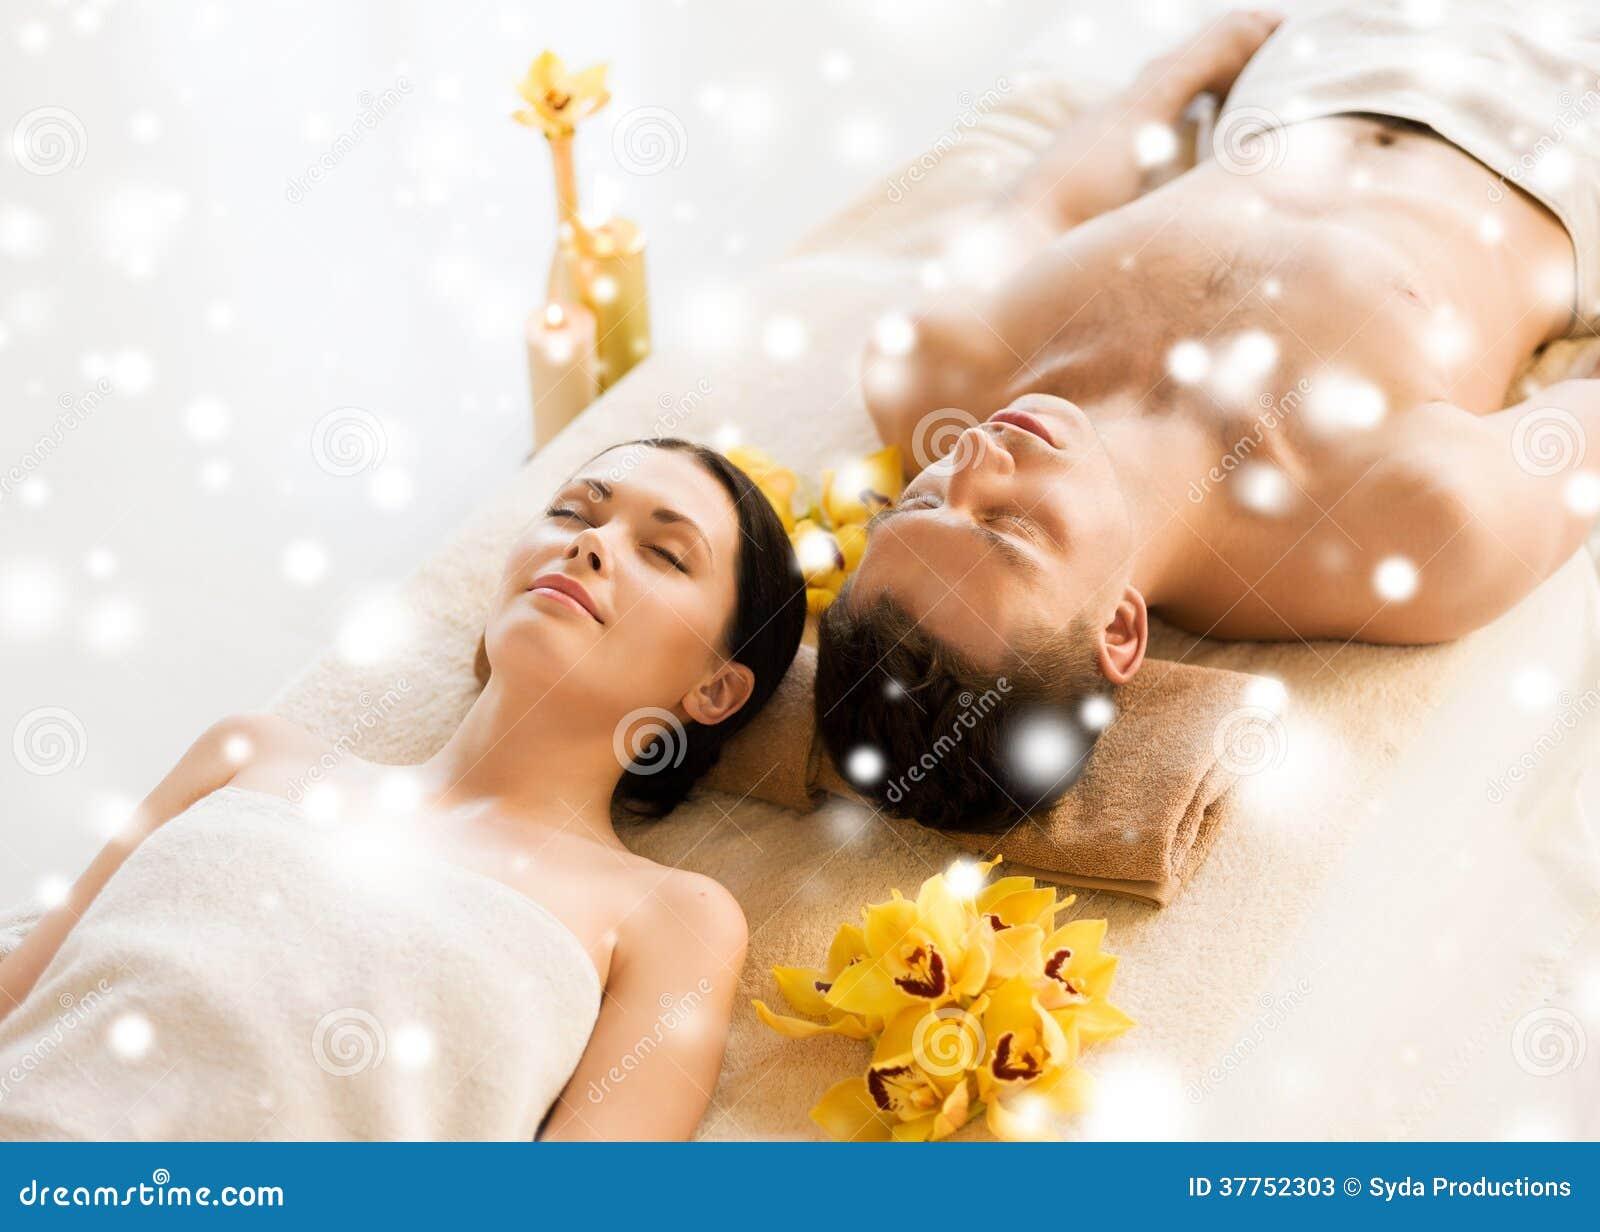 couple in spa salon lying on the massage desks stock photos image 37752303. Black Bedroom Furniture Sets. Home Design Ideas